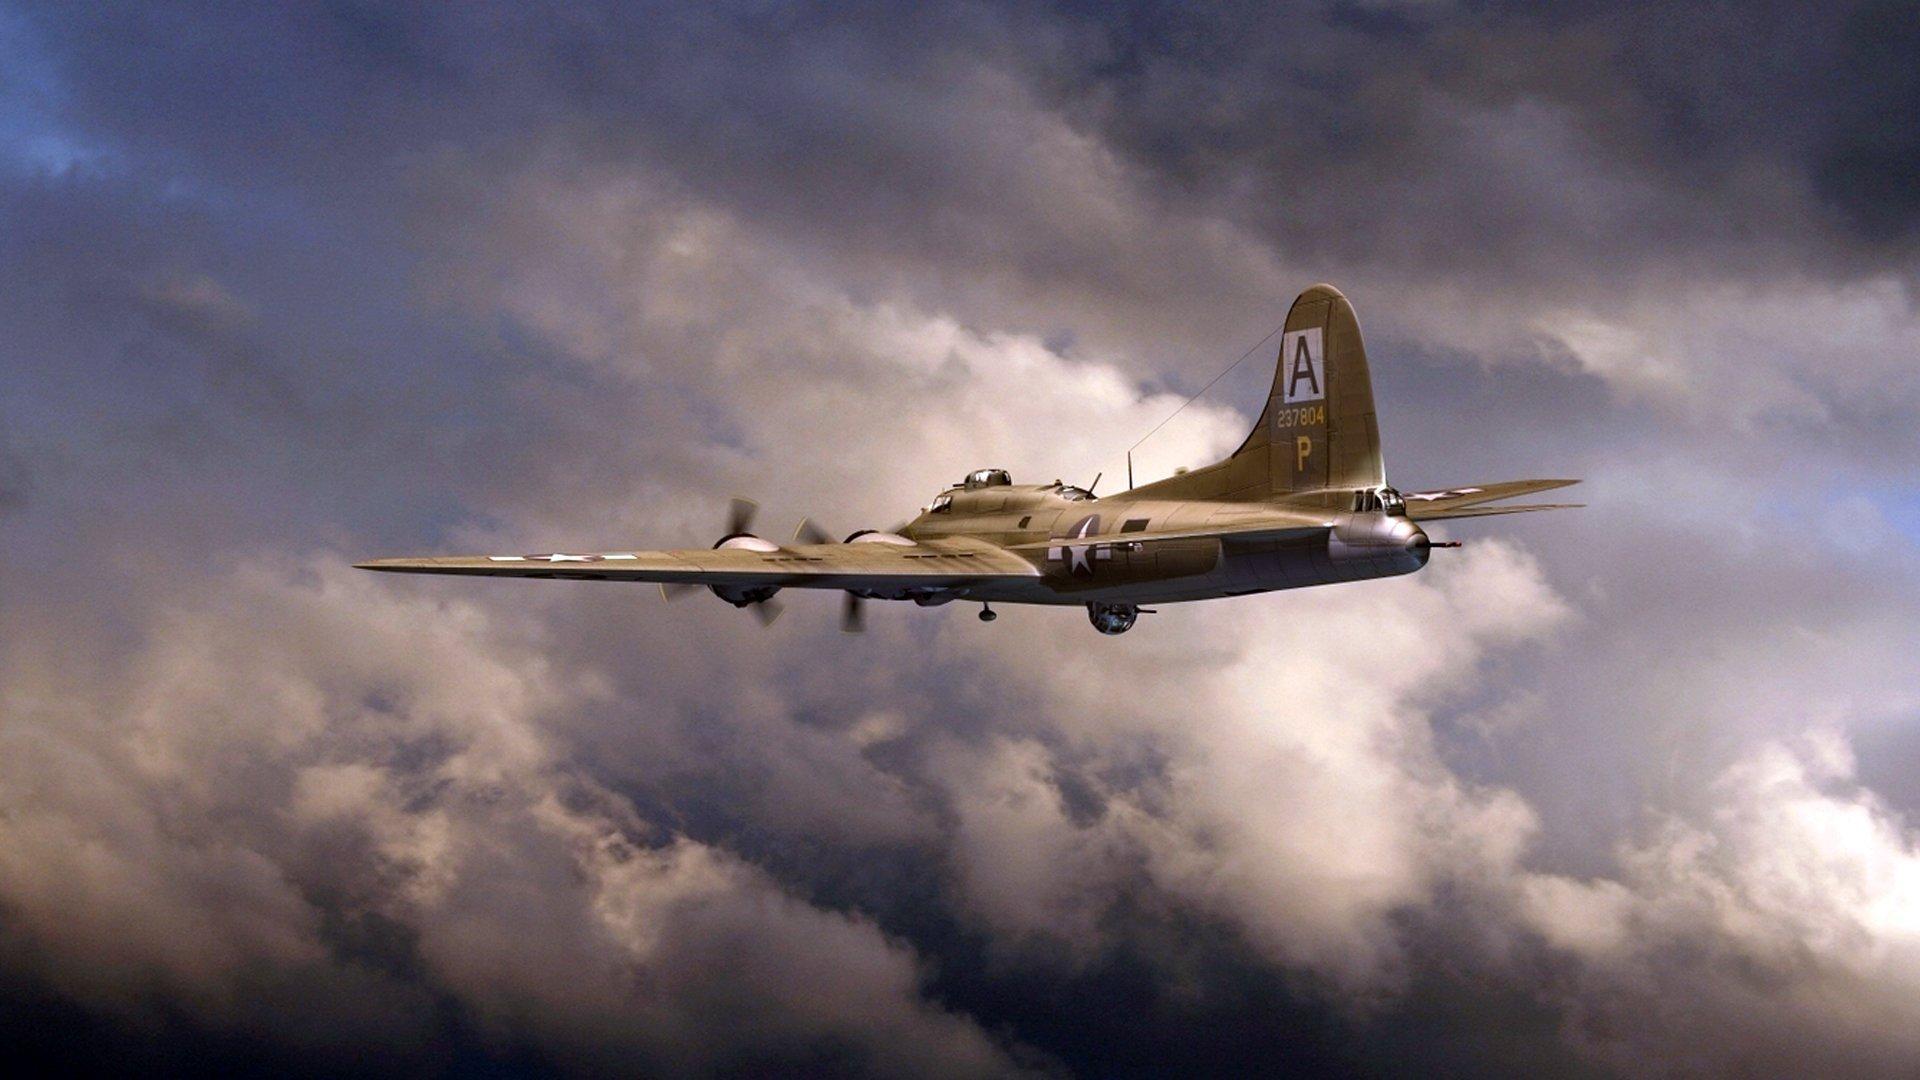 Boeing B 17 Flying Fortress Wallpaper 15   1920 X 1080 stmednet 1920x1080